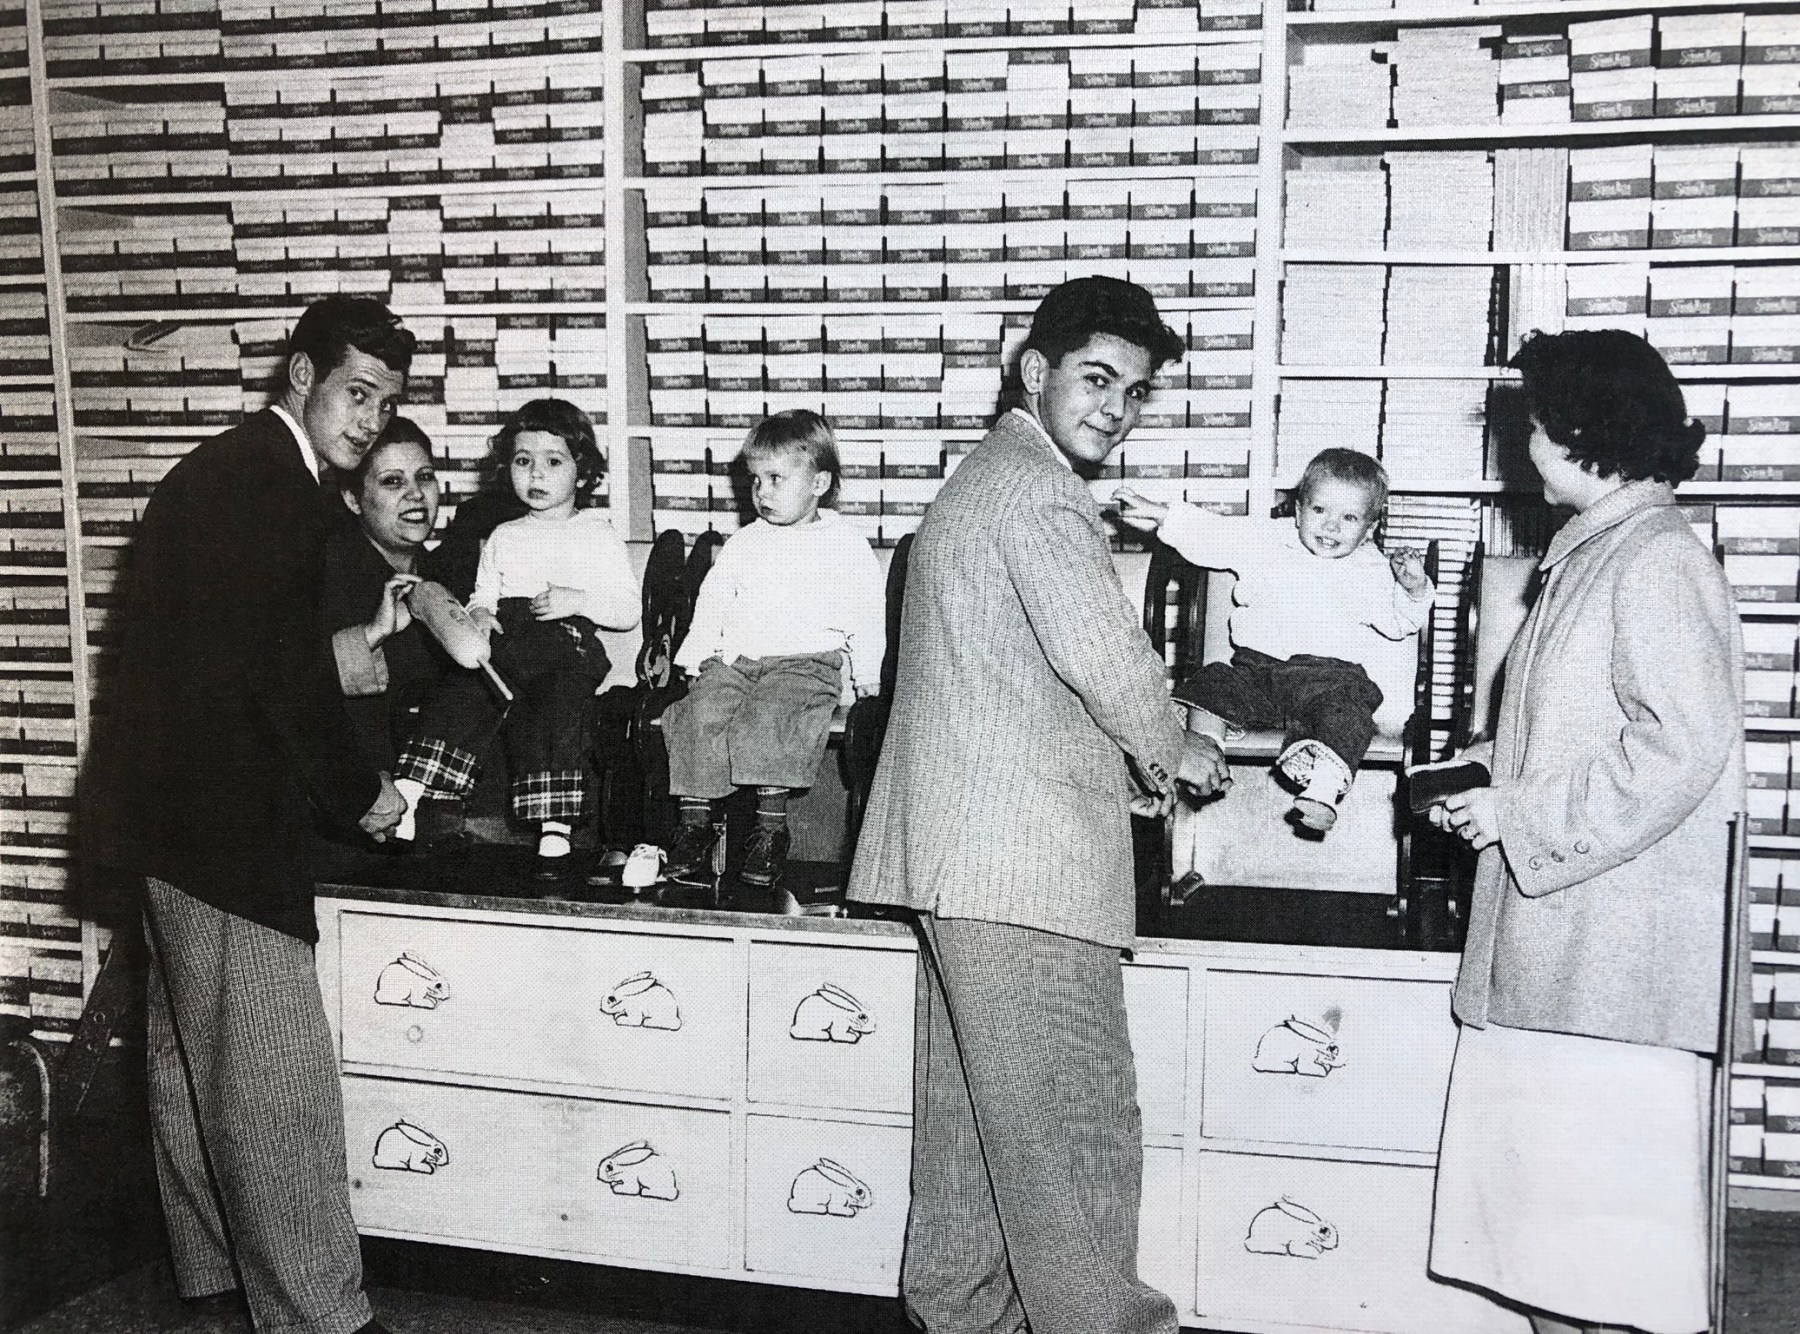 Bond Shoe Store, October 1953